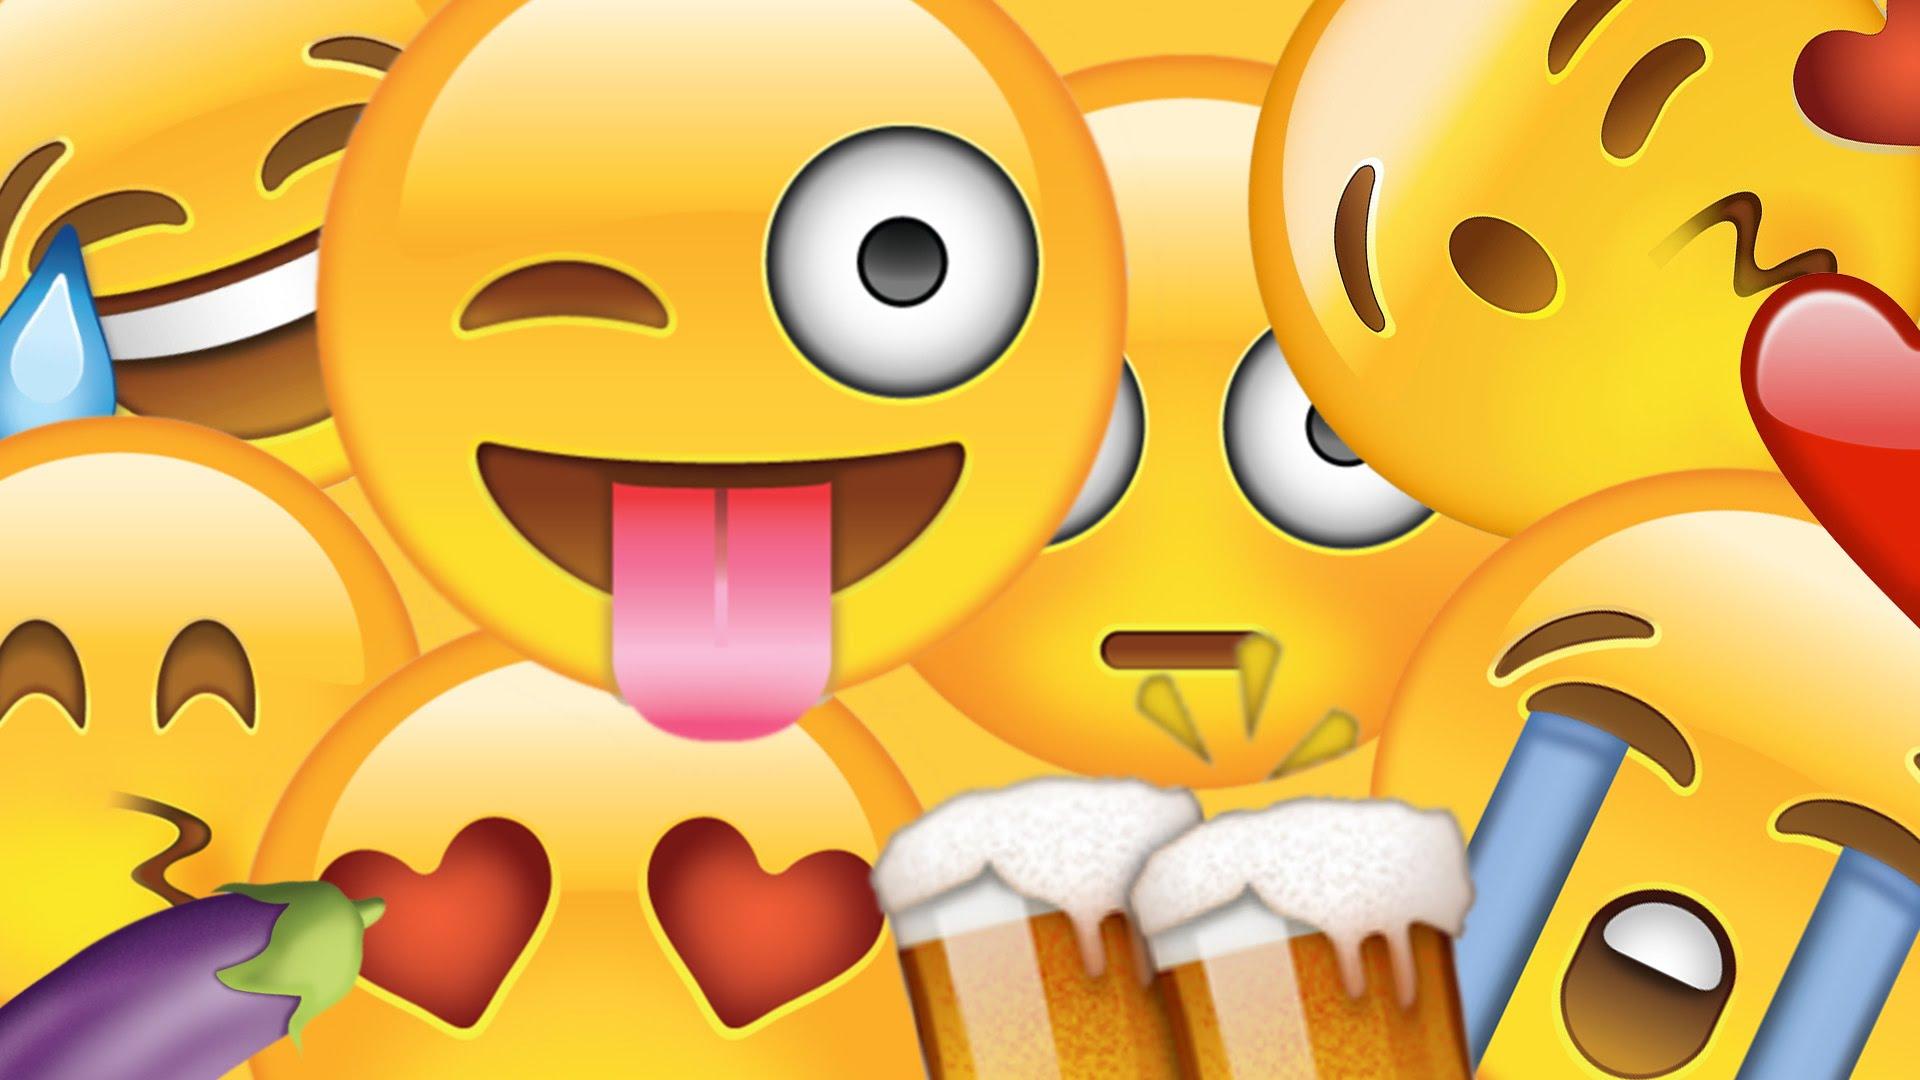 emoji feat image-zilbest